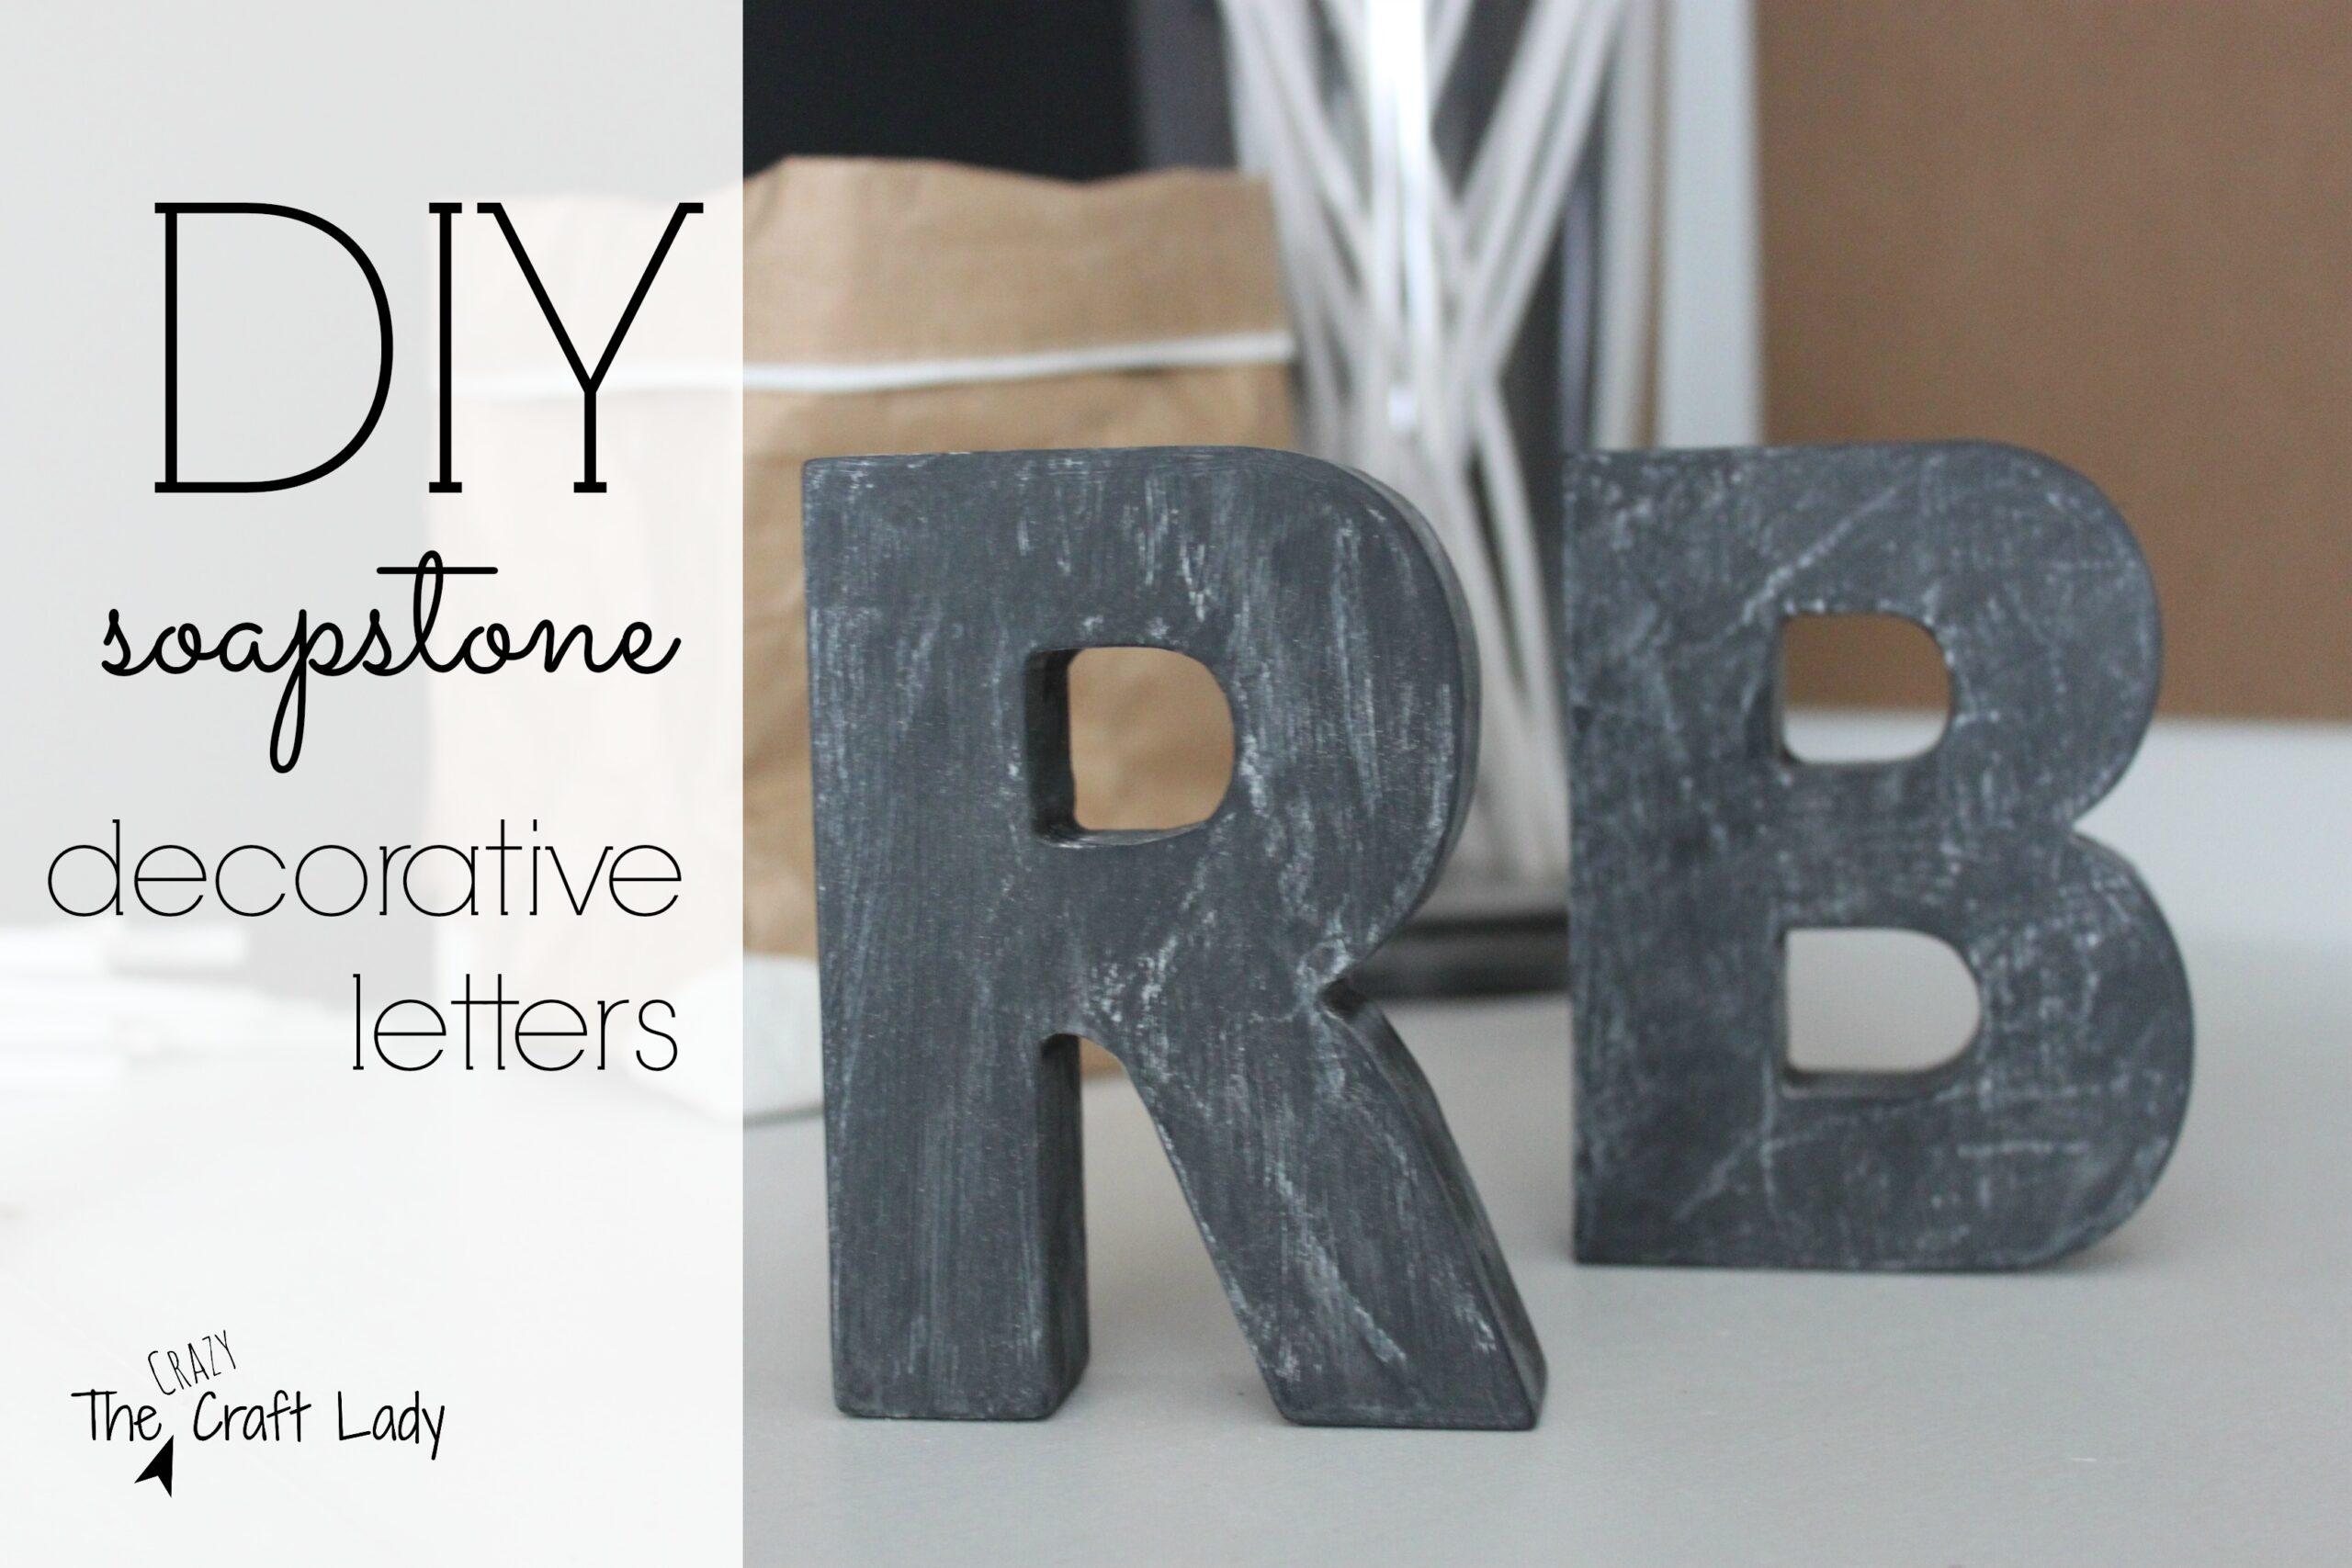 DIY Soapstone Decorative Letters